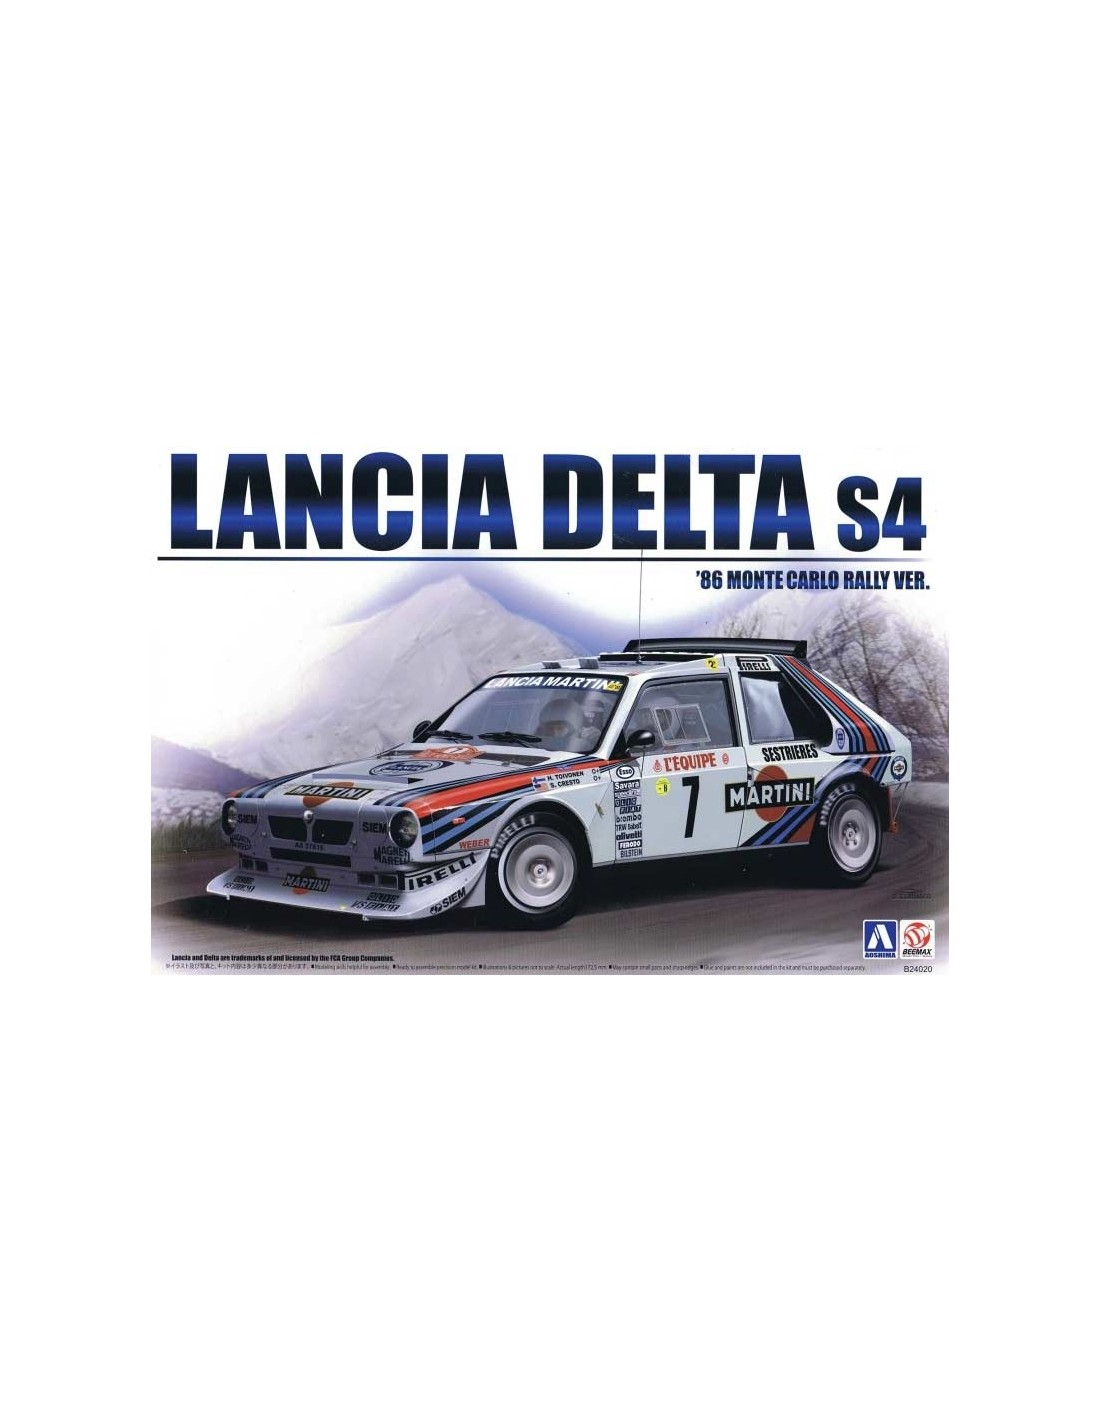 Aoshima B24020 1 24 Lancia Delta S4 1986 Monte Carlo